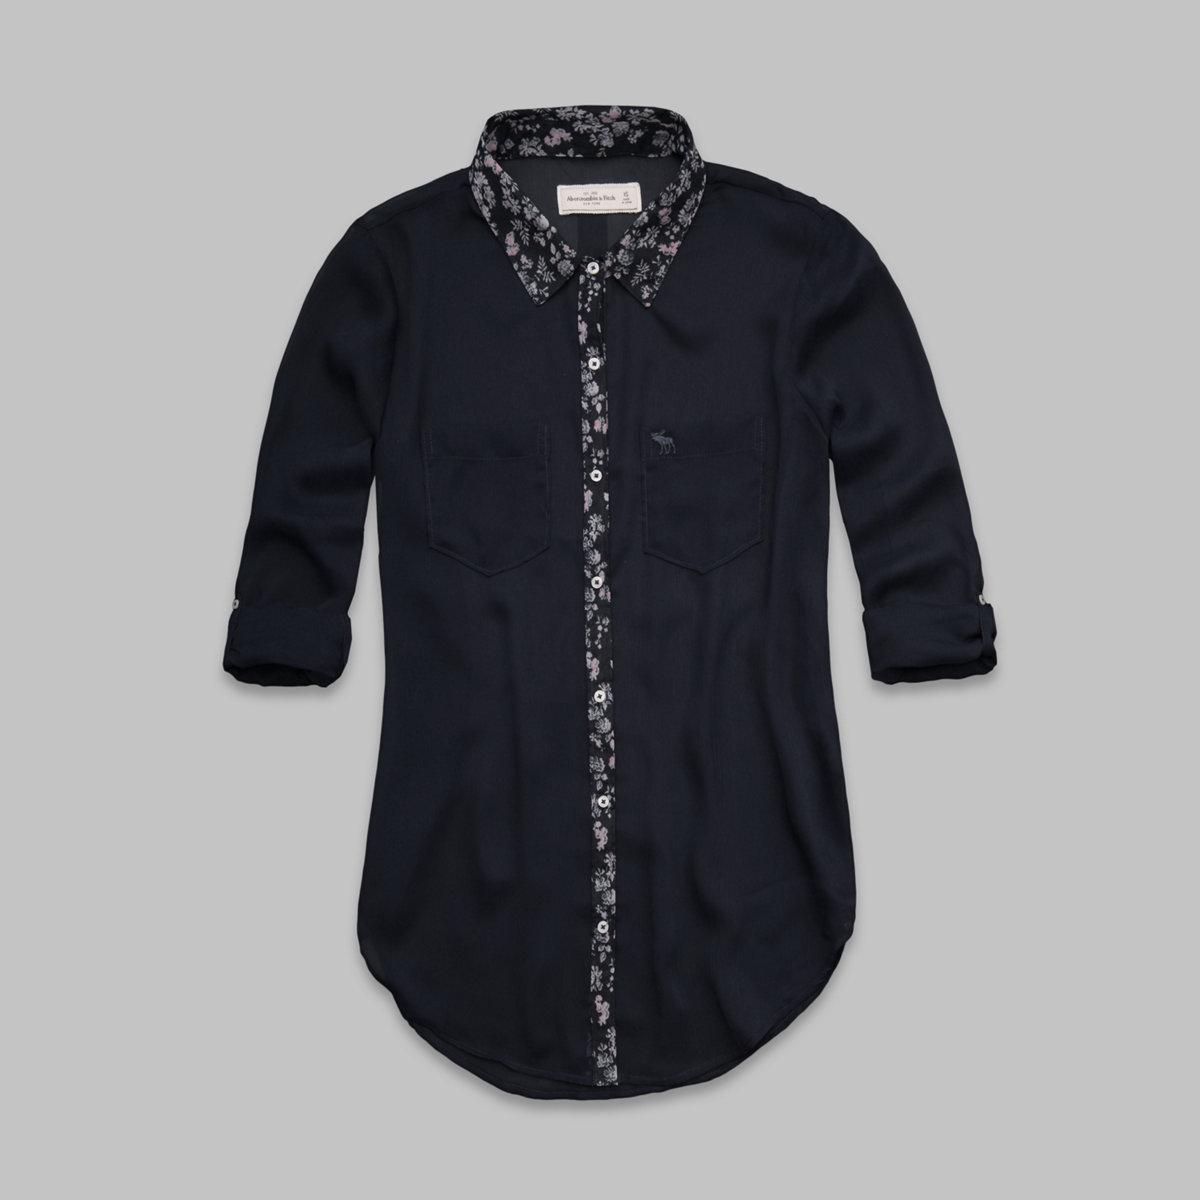 Janna Chiffon Shirt